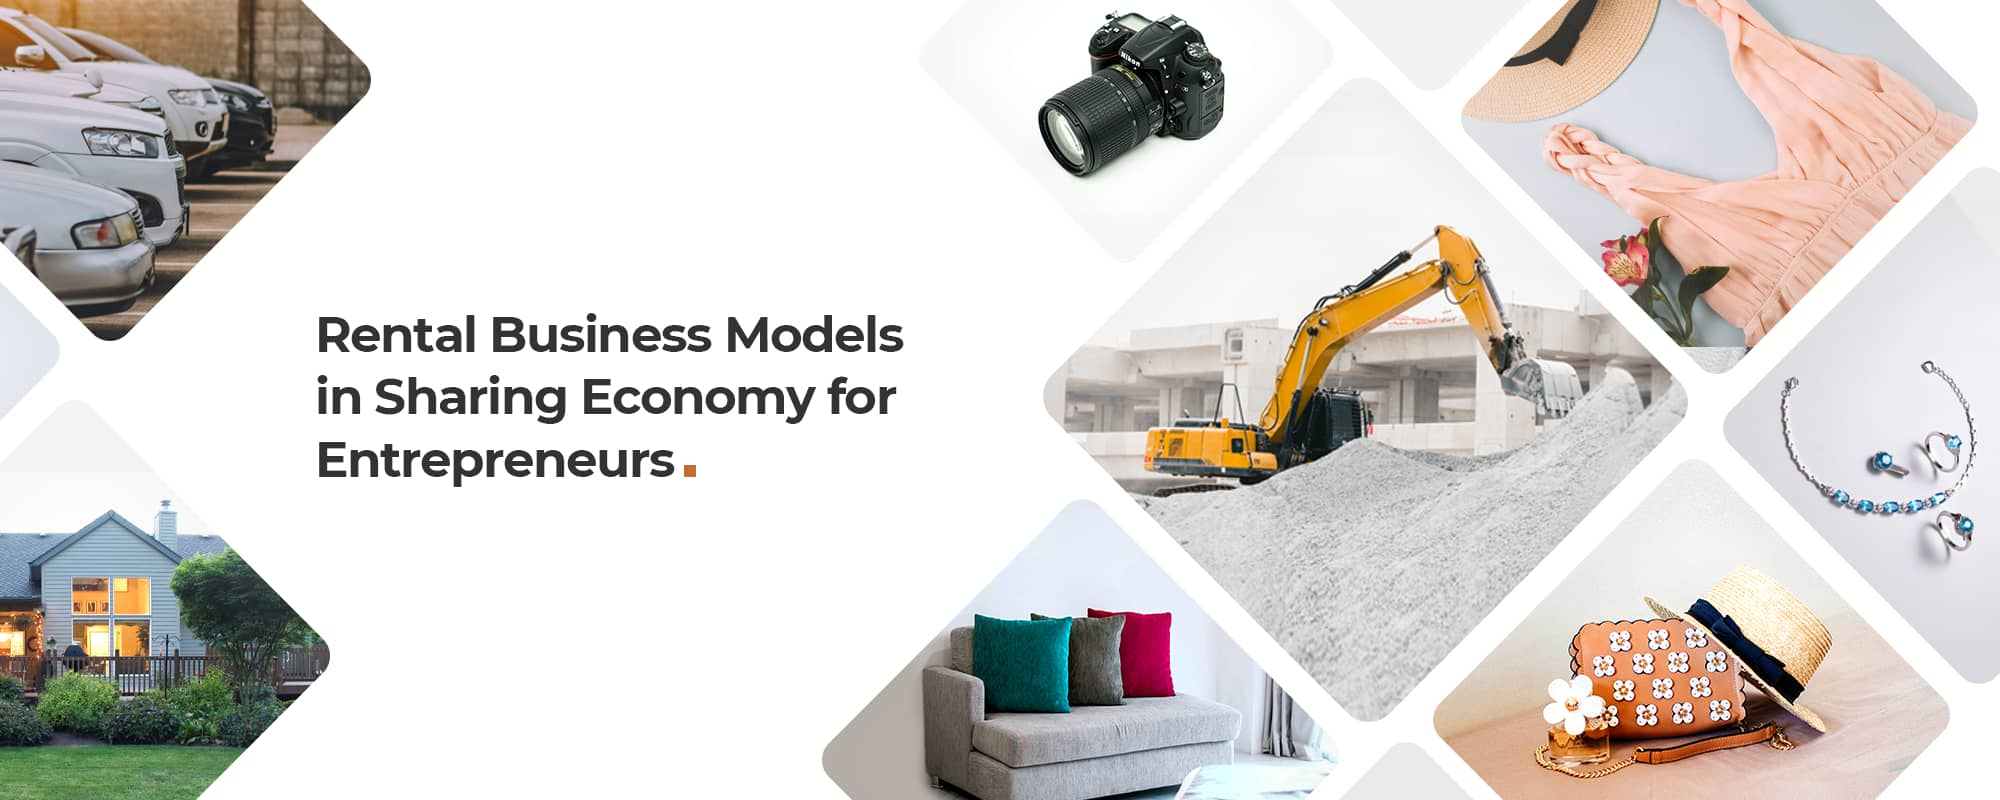 New-Age Rental Business Ideas in Sharing Economy for Digital Entrepreneurs